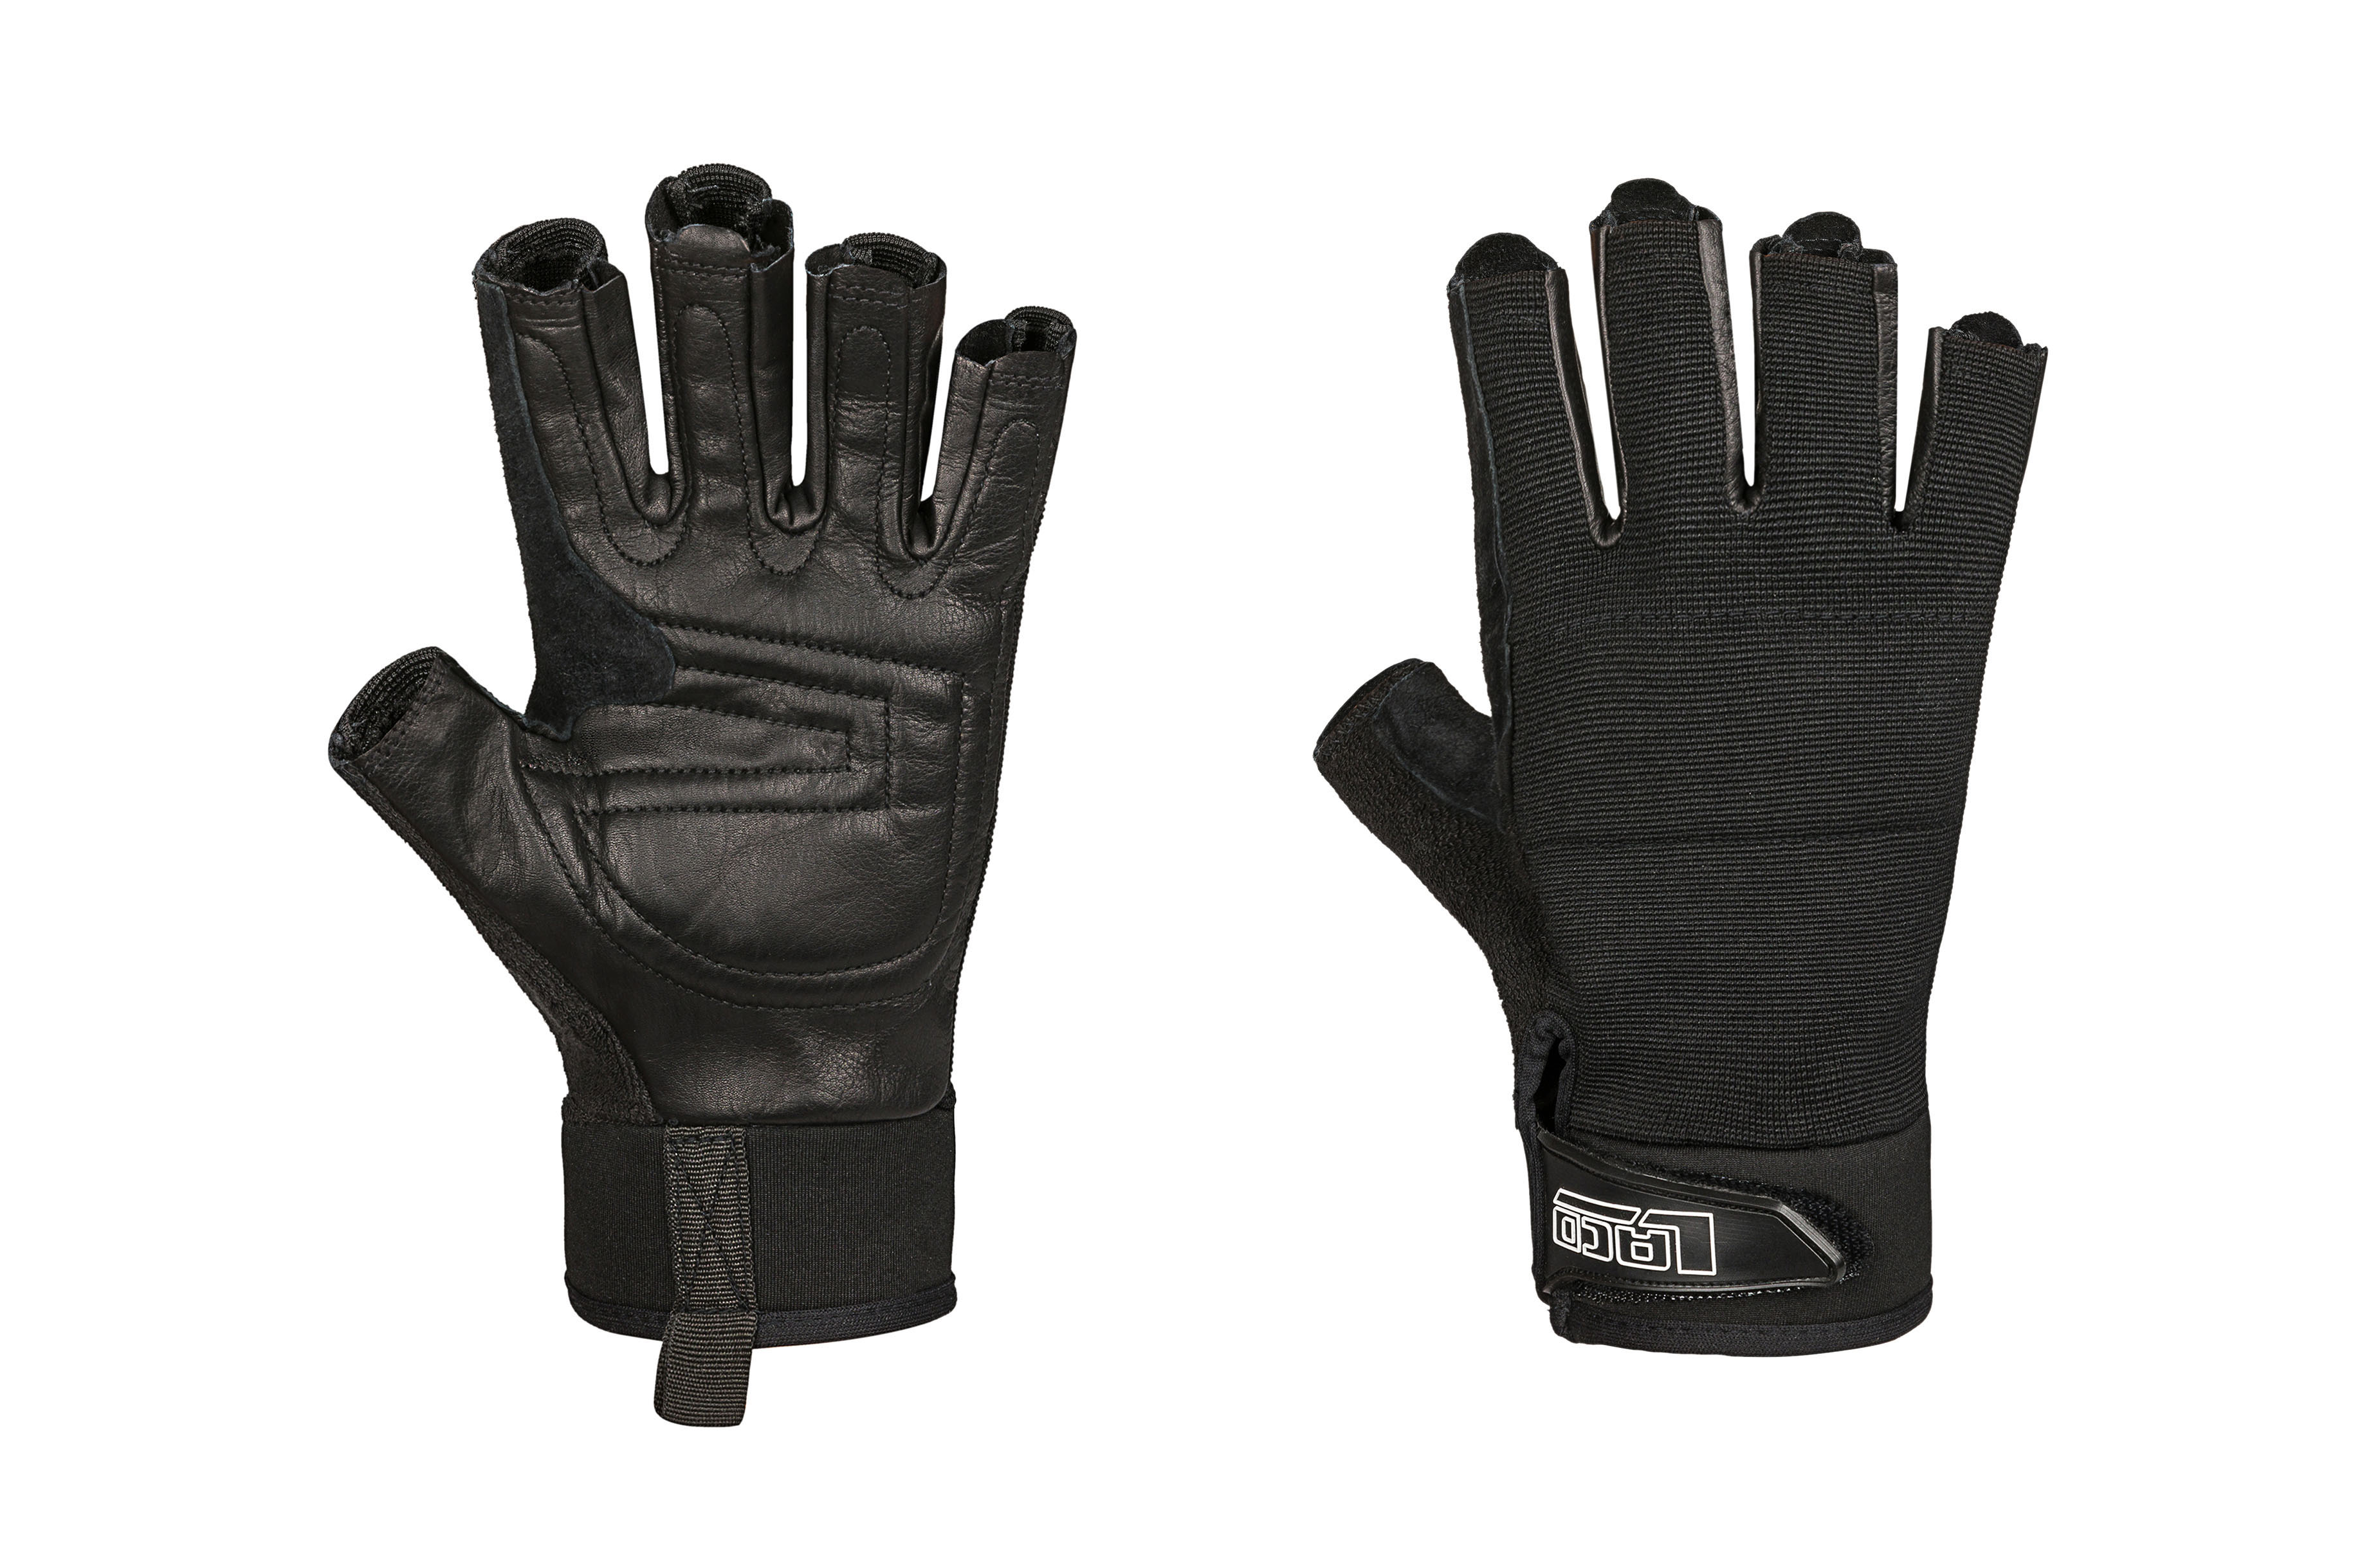 Klettersteig Handschuhe : Lacd via ferrata gloves pro u klettersteighandschuhe